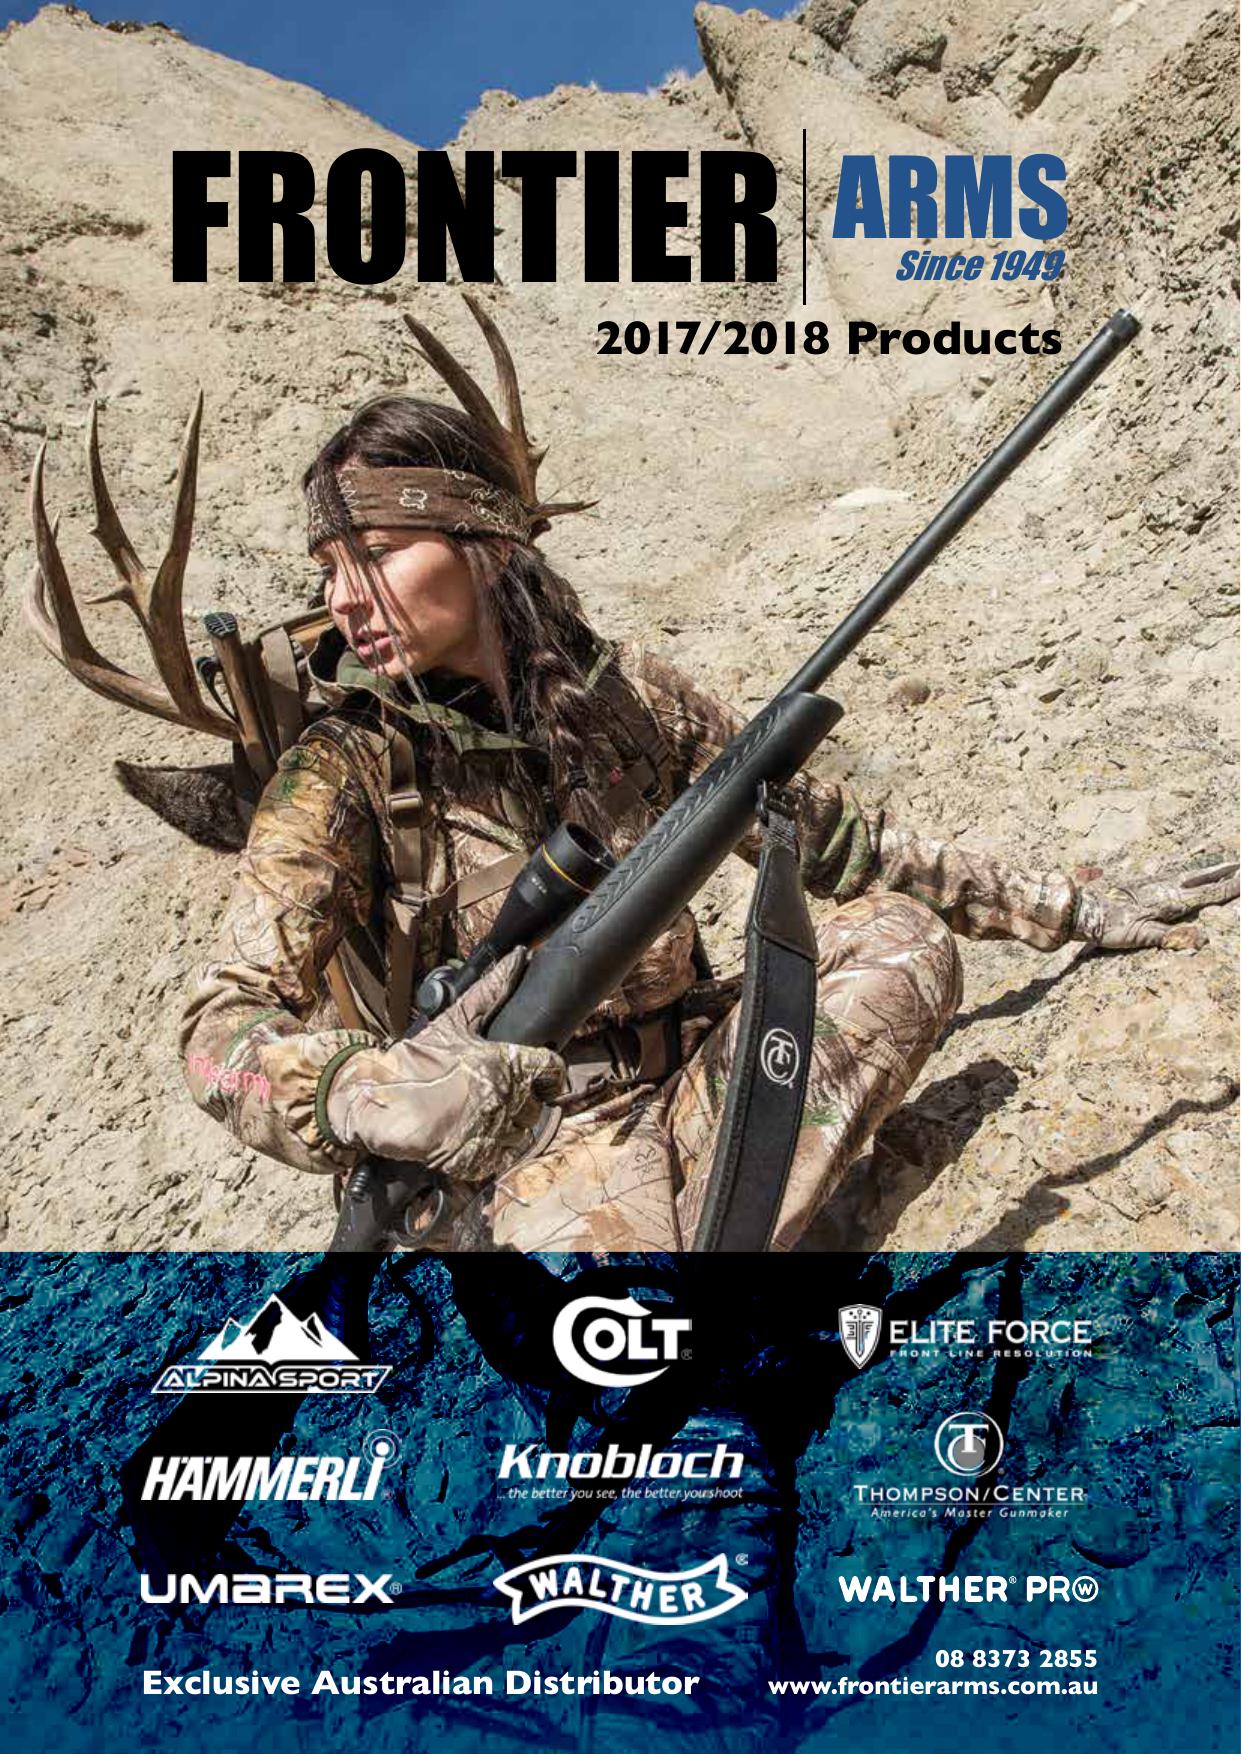 ec6cb8e0fe8 2017 2018 Products